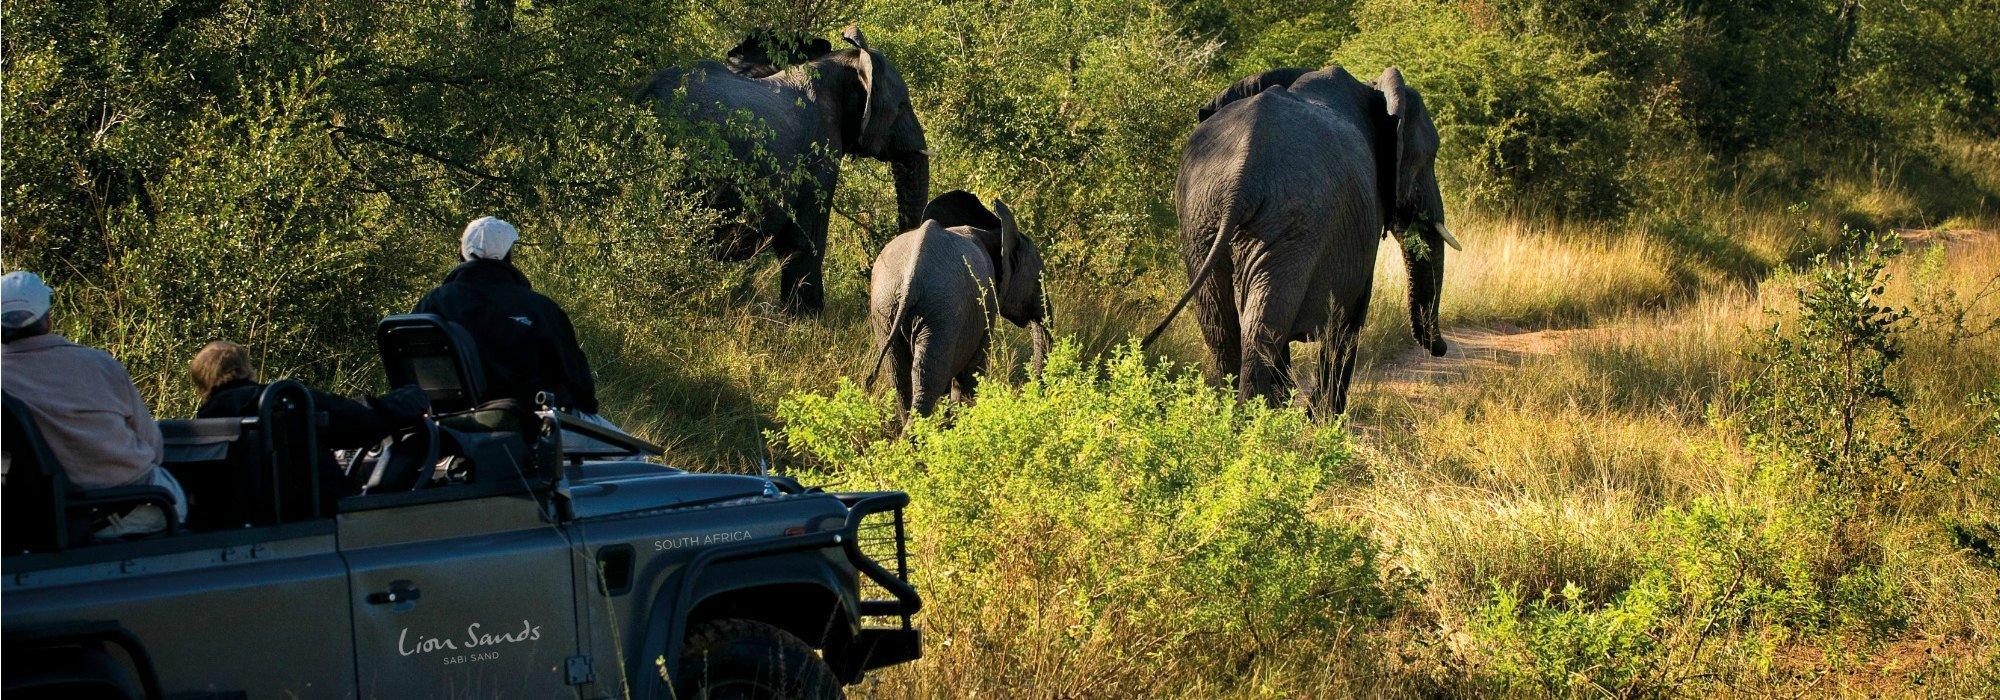 Lions Sands Game Reserve Safari